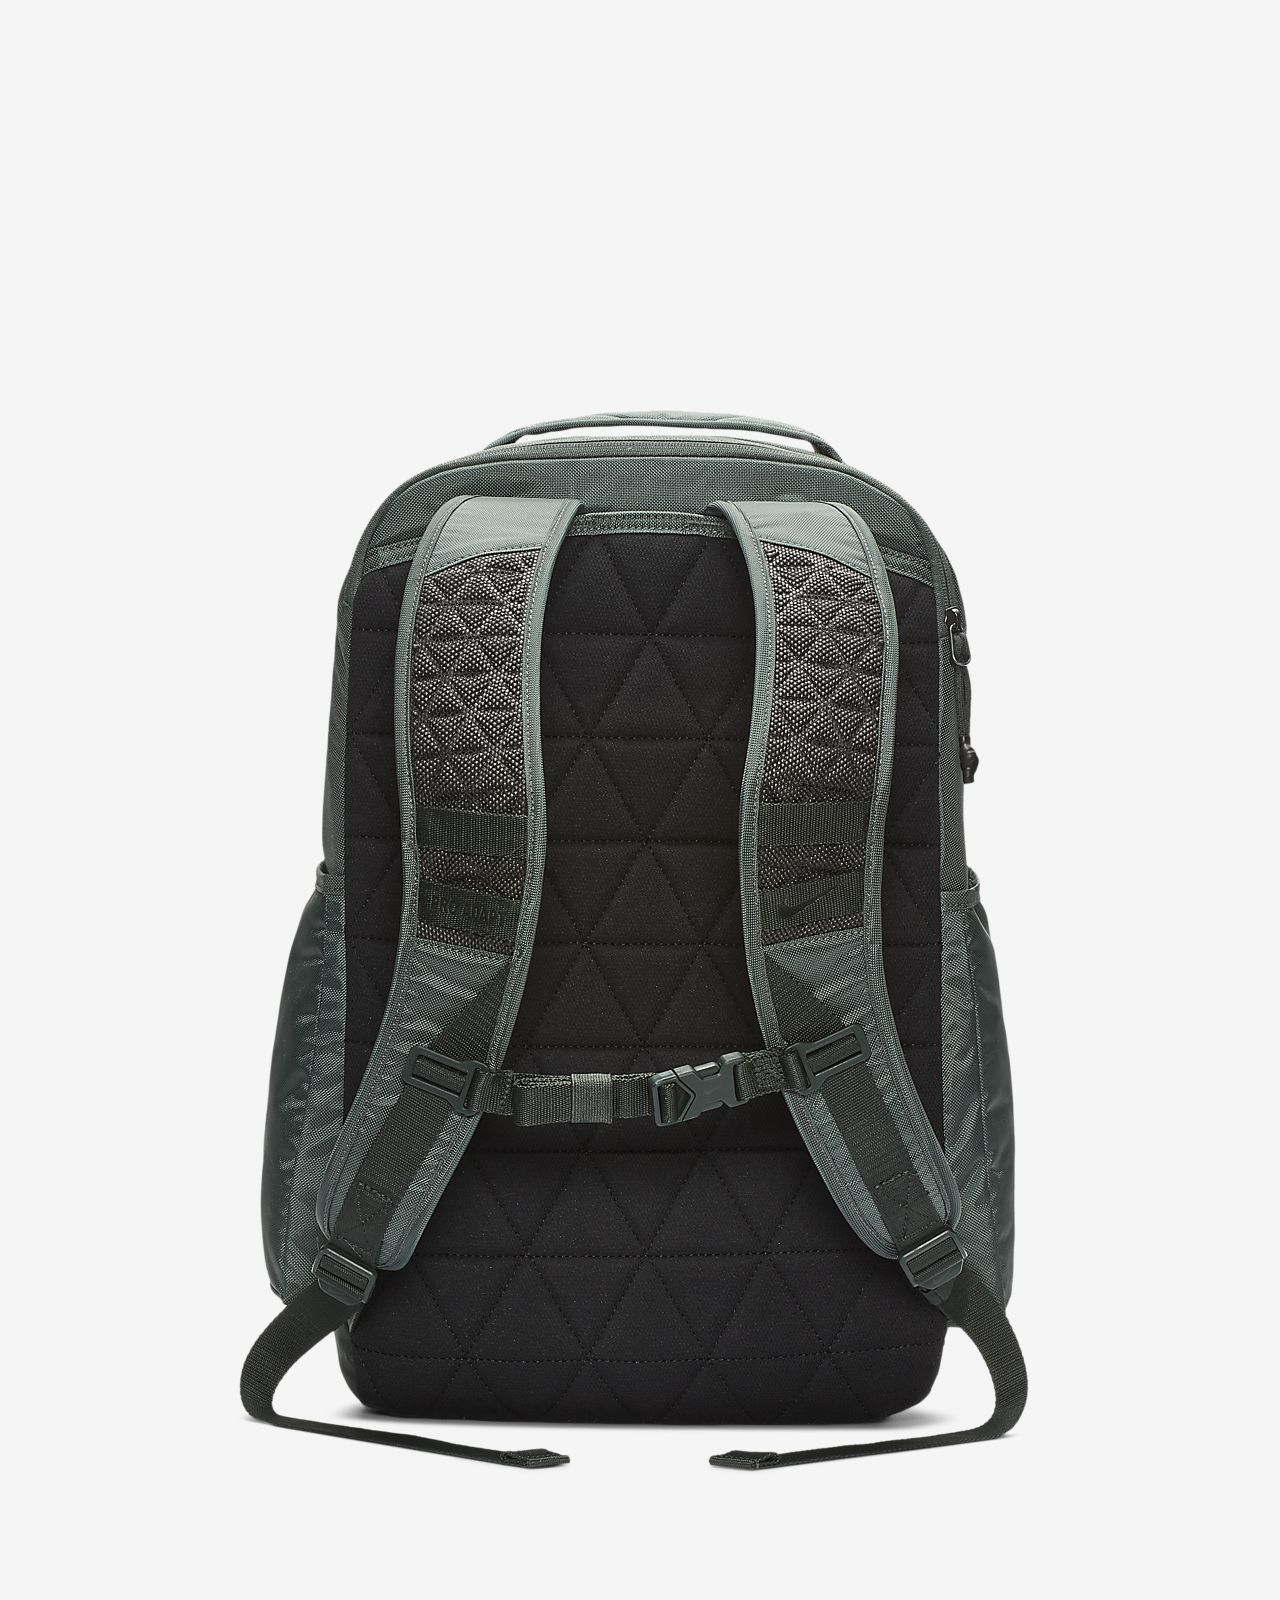 94cb41c2f2d9 Nike Vapor Power 2.0 Training Backpack. Nike.com